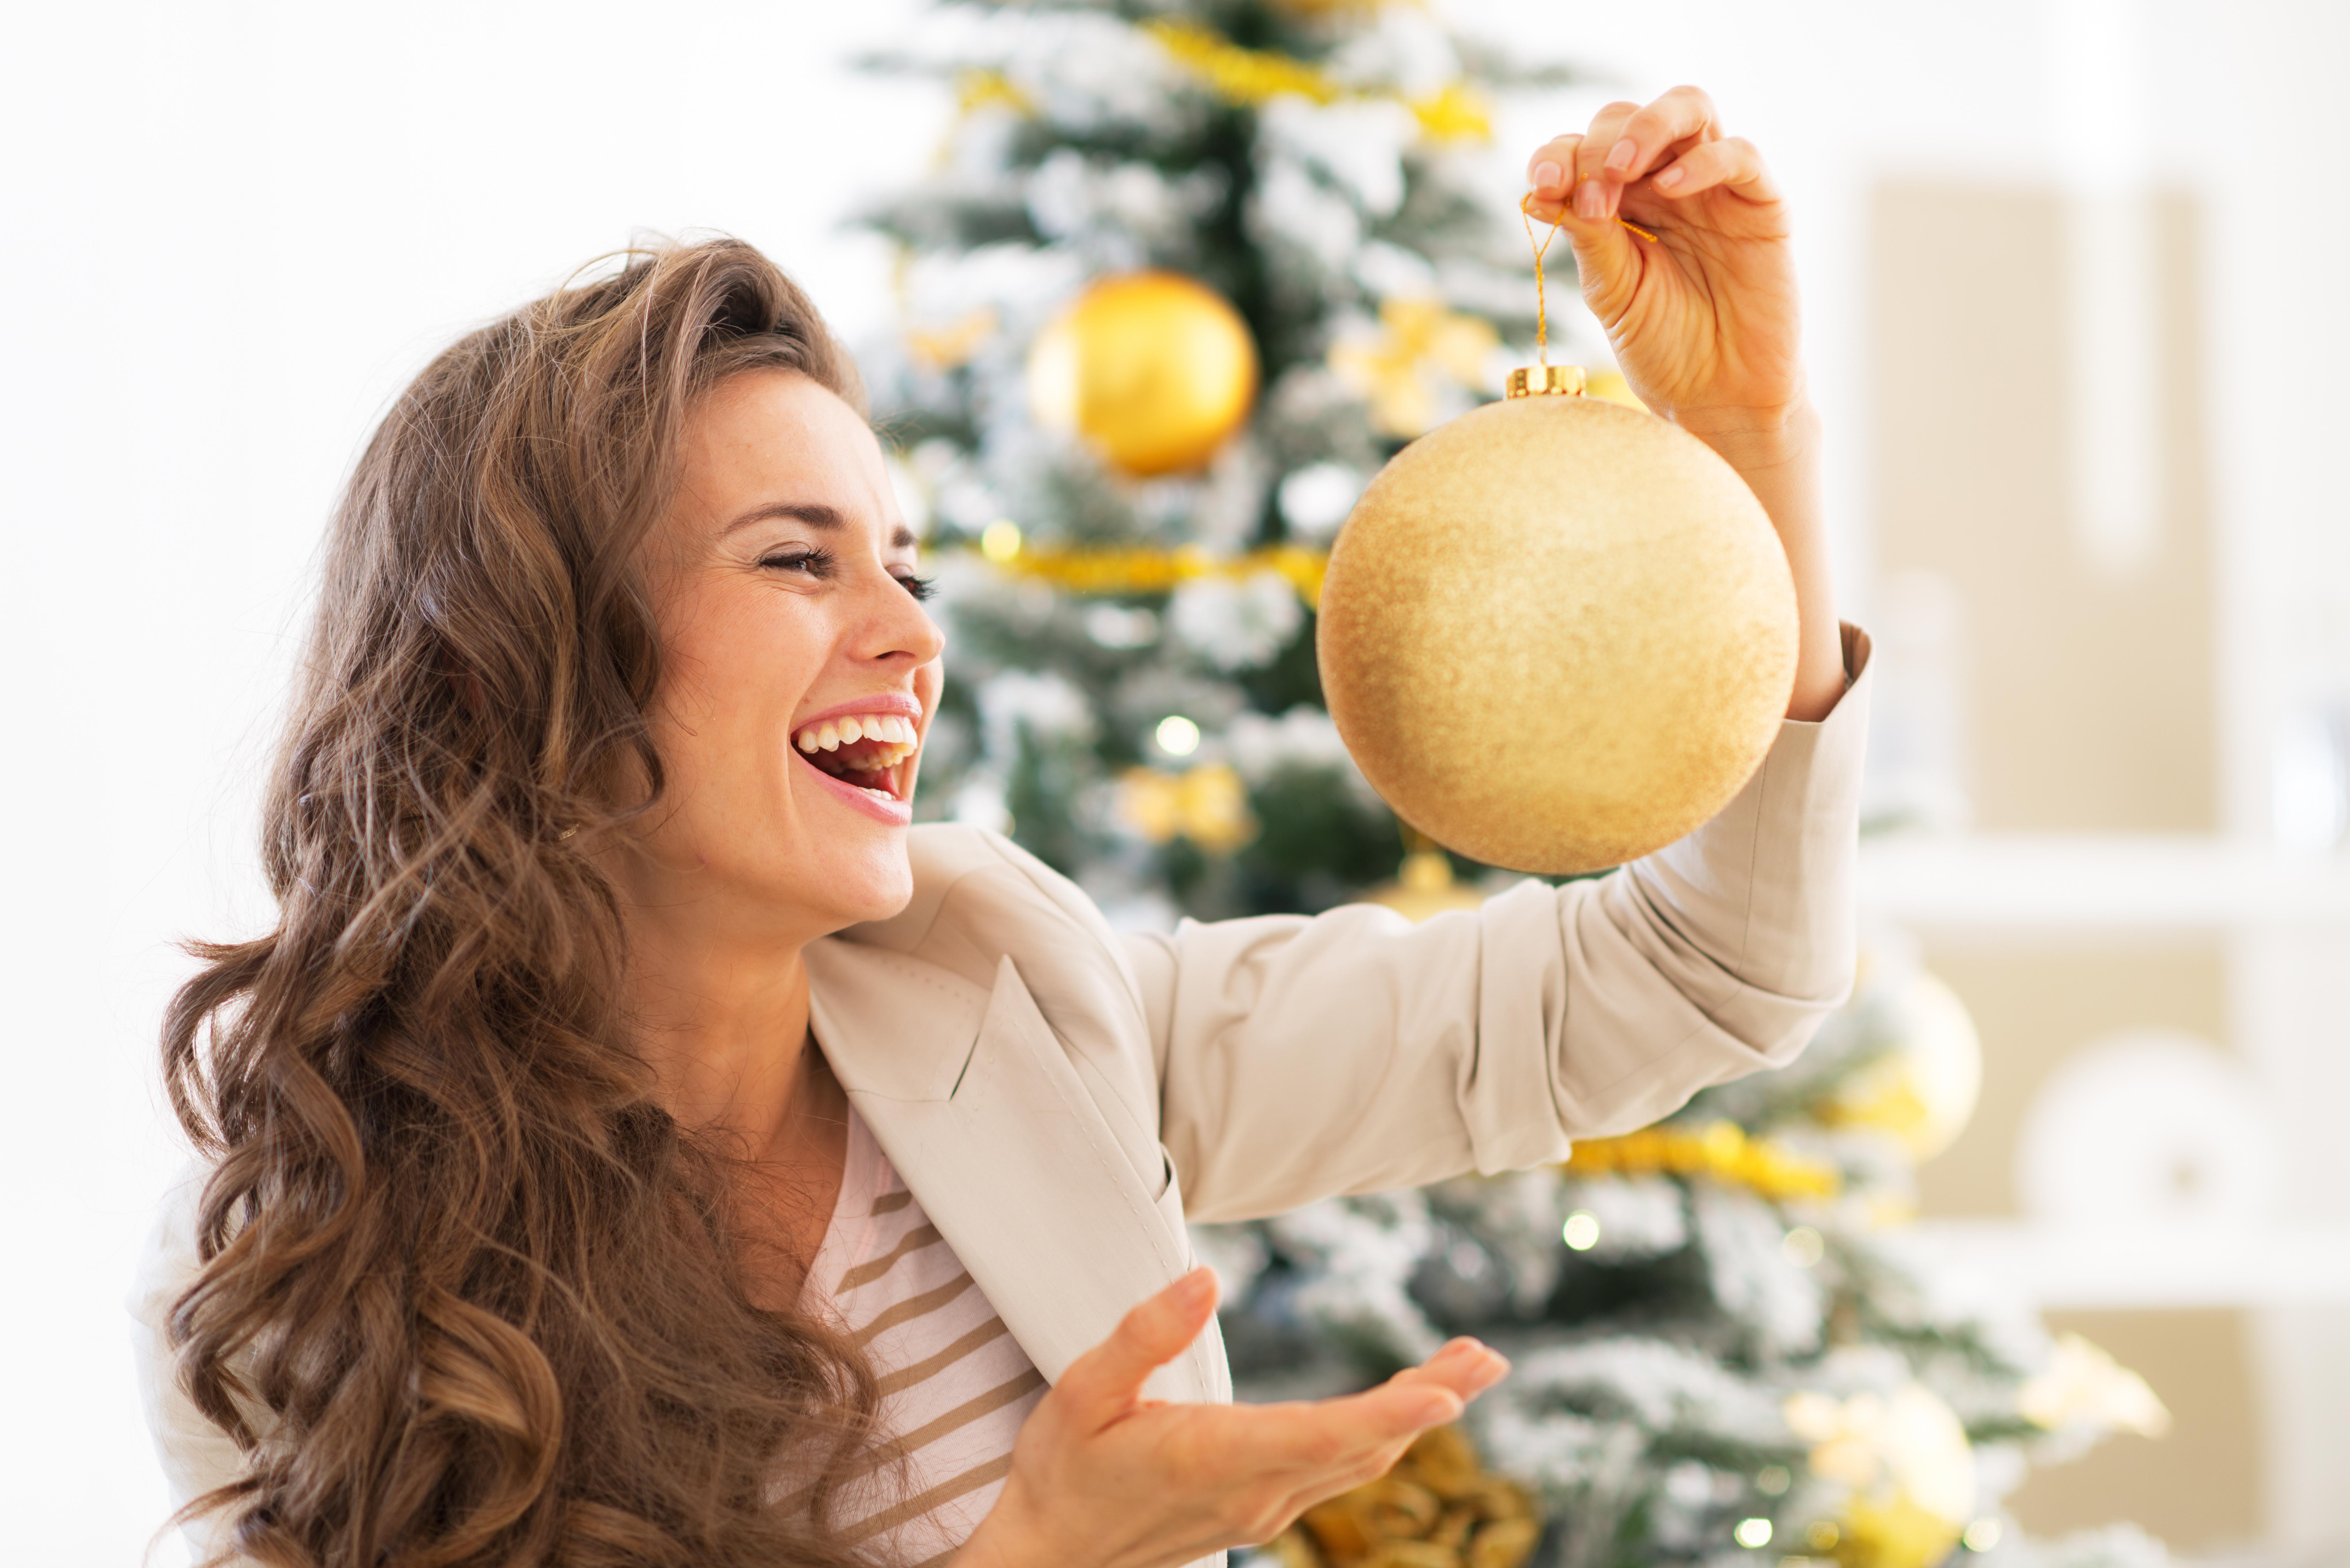 Christmas womanshutterstock_232327666.jpg